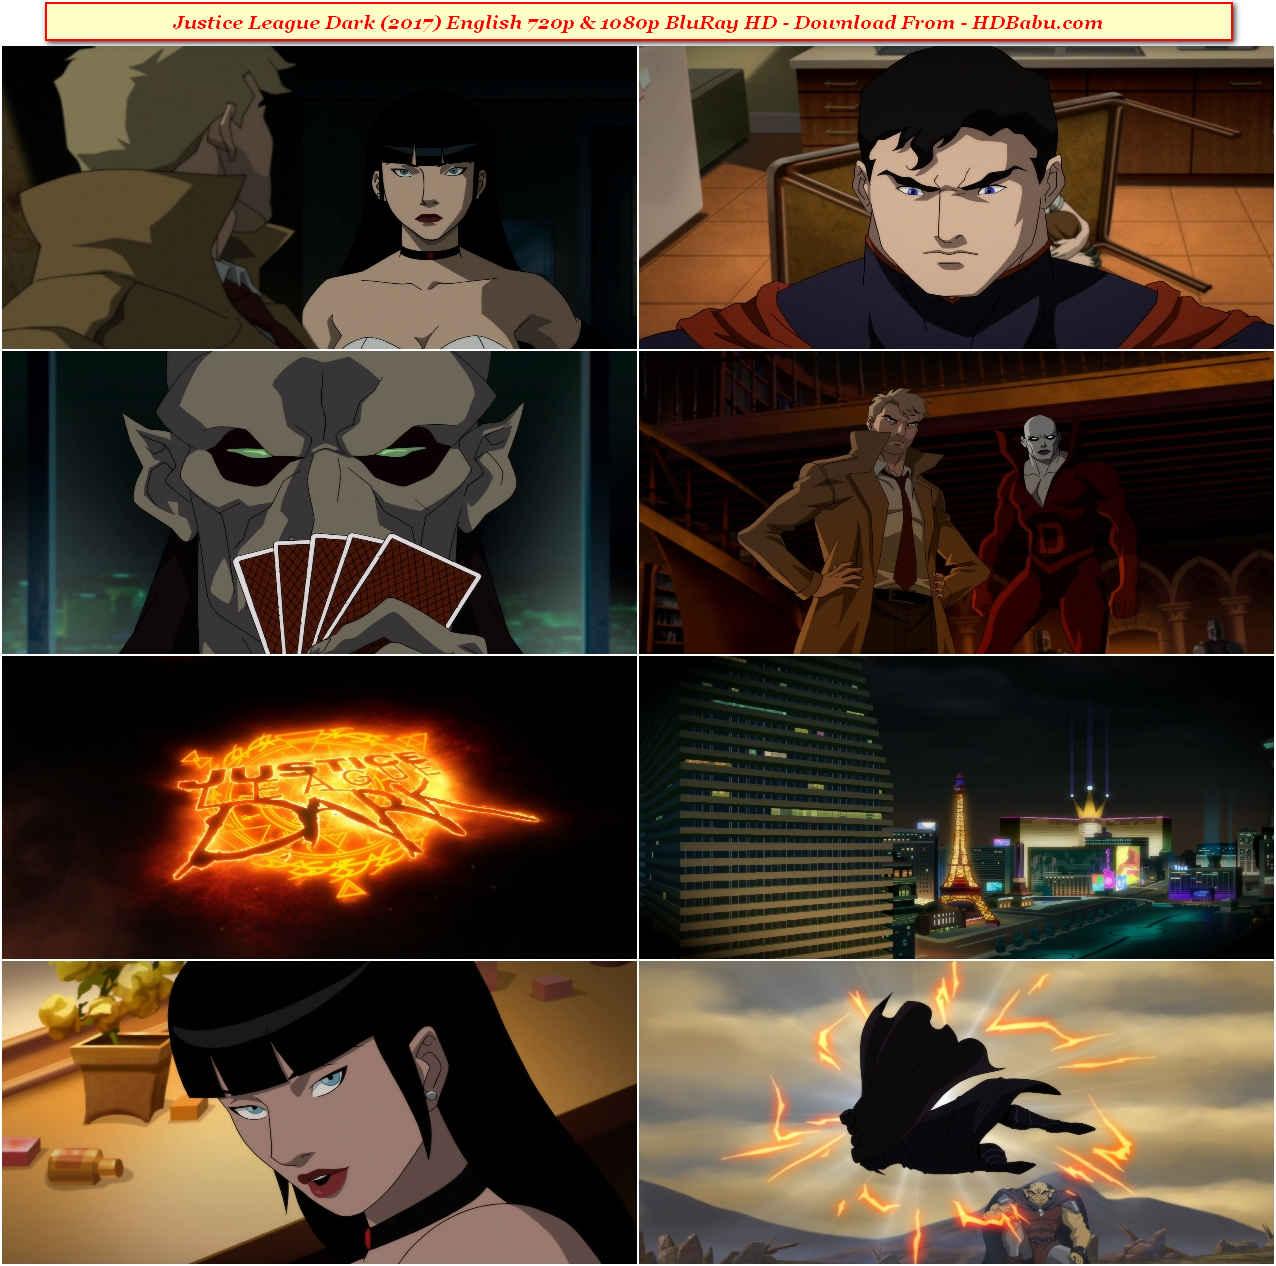 Justice League Dark Full Movie Download